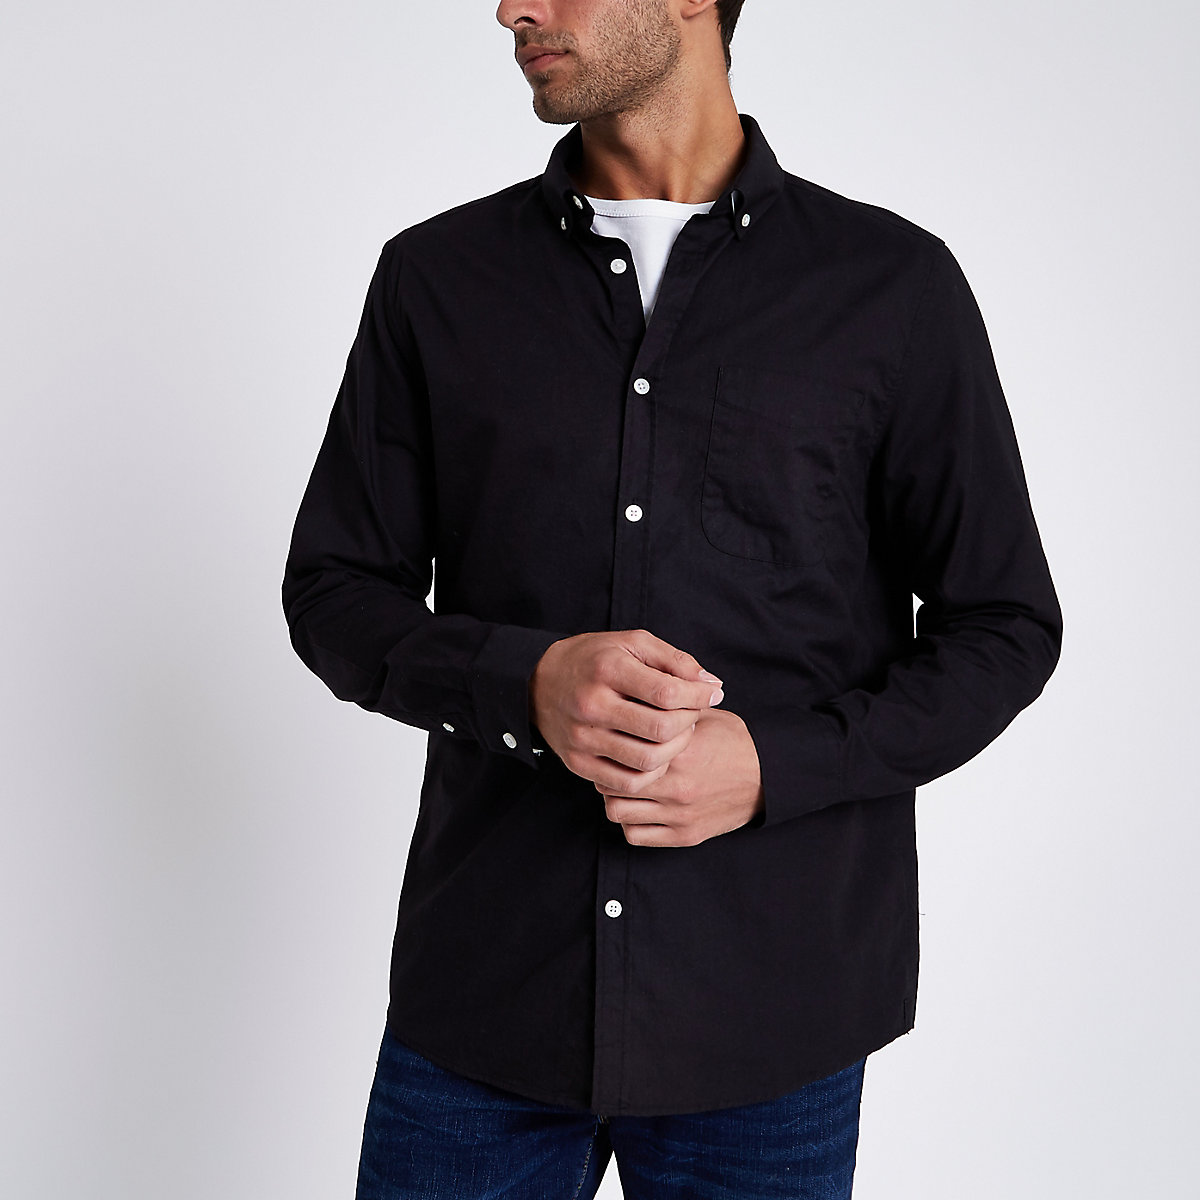 Black long sleeve Oxford shirt